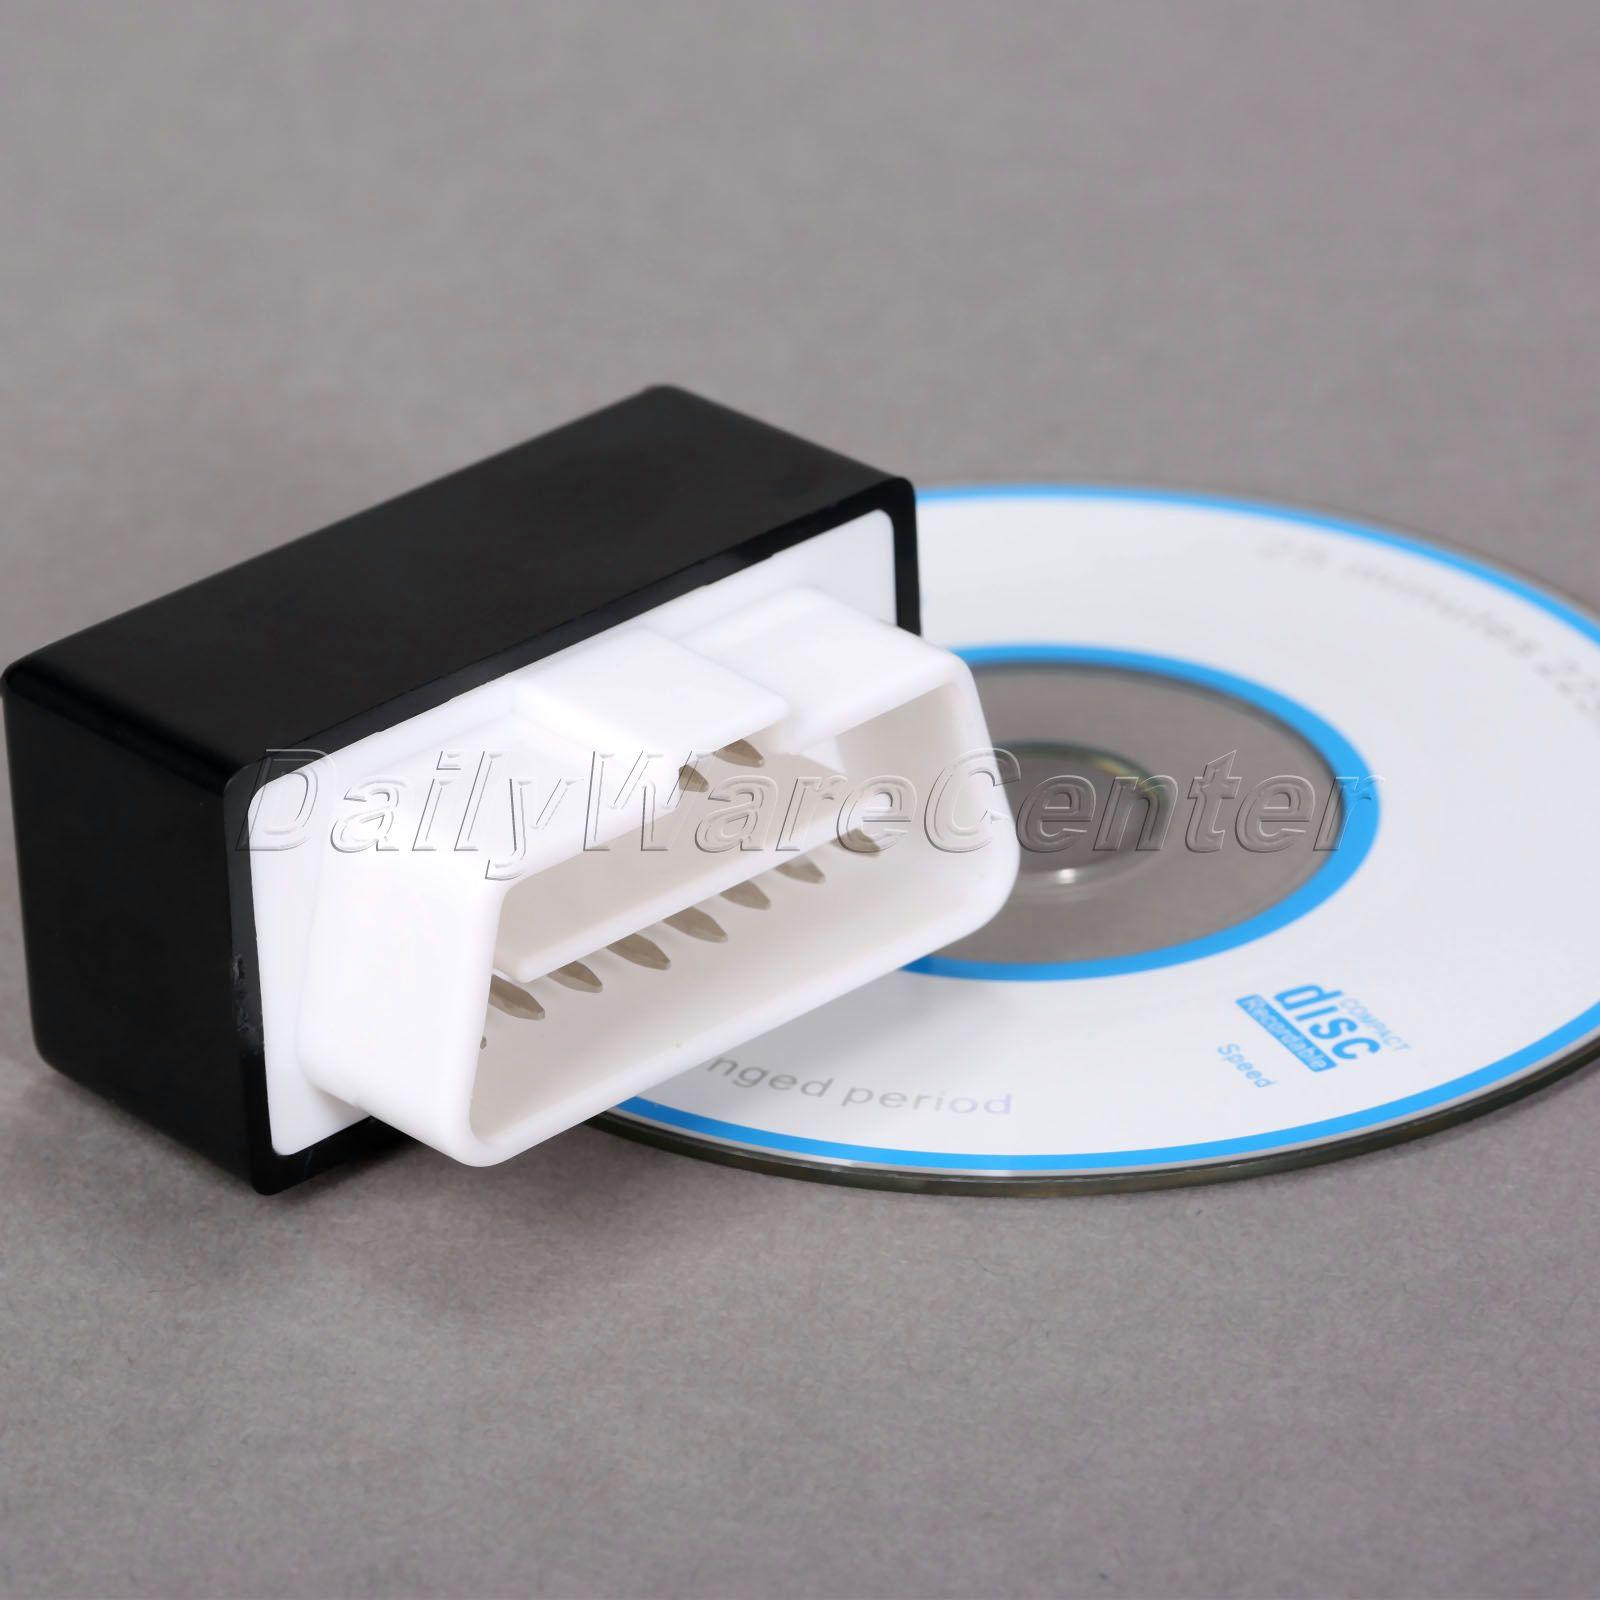 ■Mini ELM327 V2 1 OBDII OBD2 CAN BUS Bluetooth Otomatik Teşhis